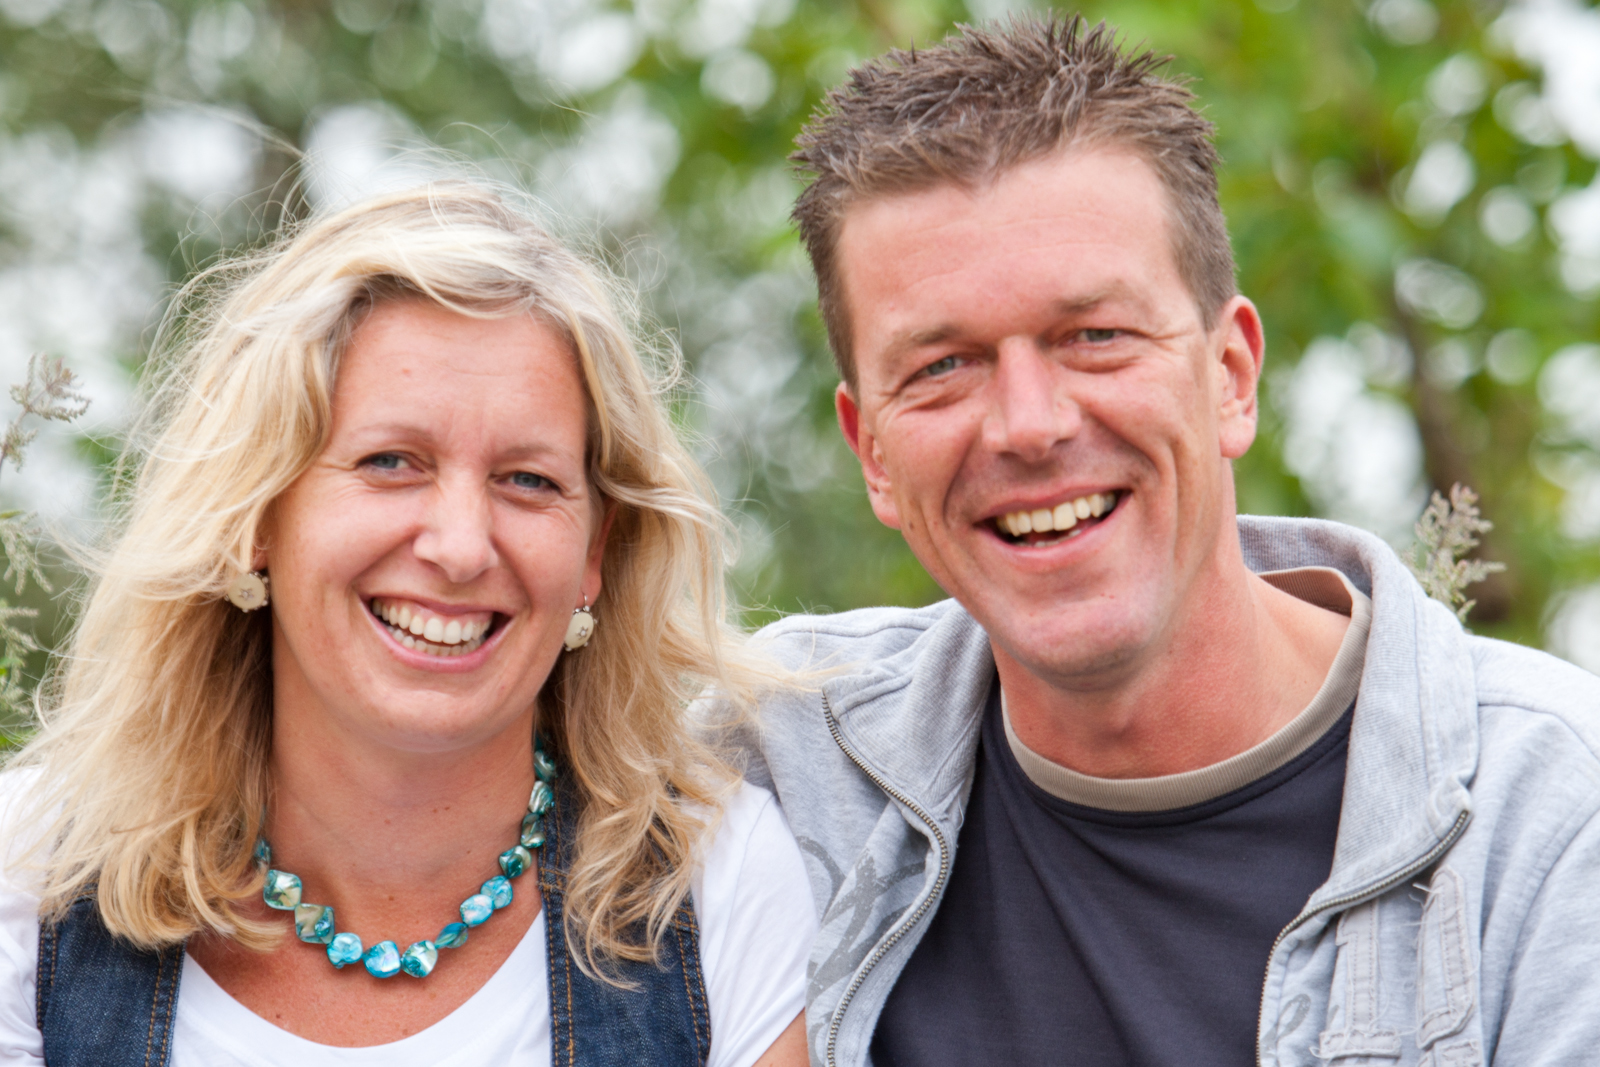 Zorgondernemer Thomashuis: De kinderen vinden 't keigezellig